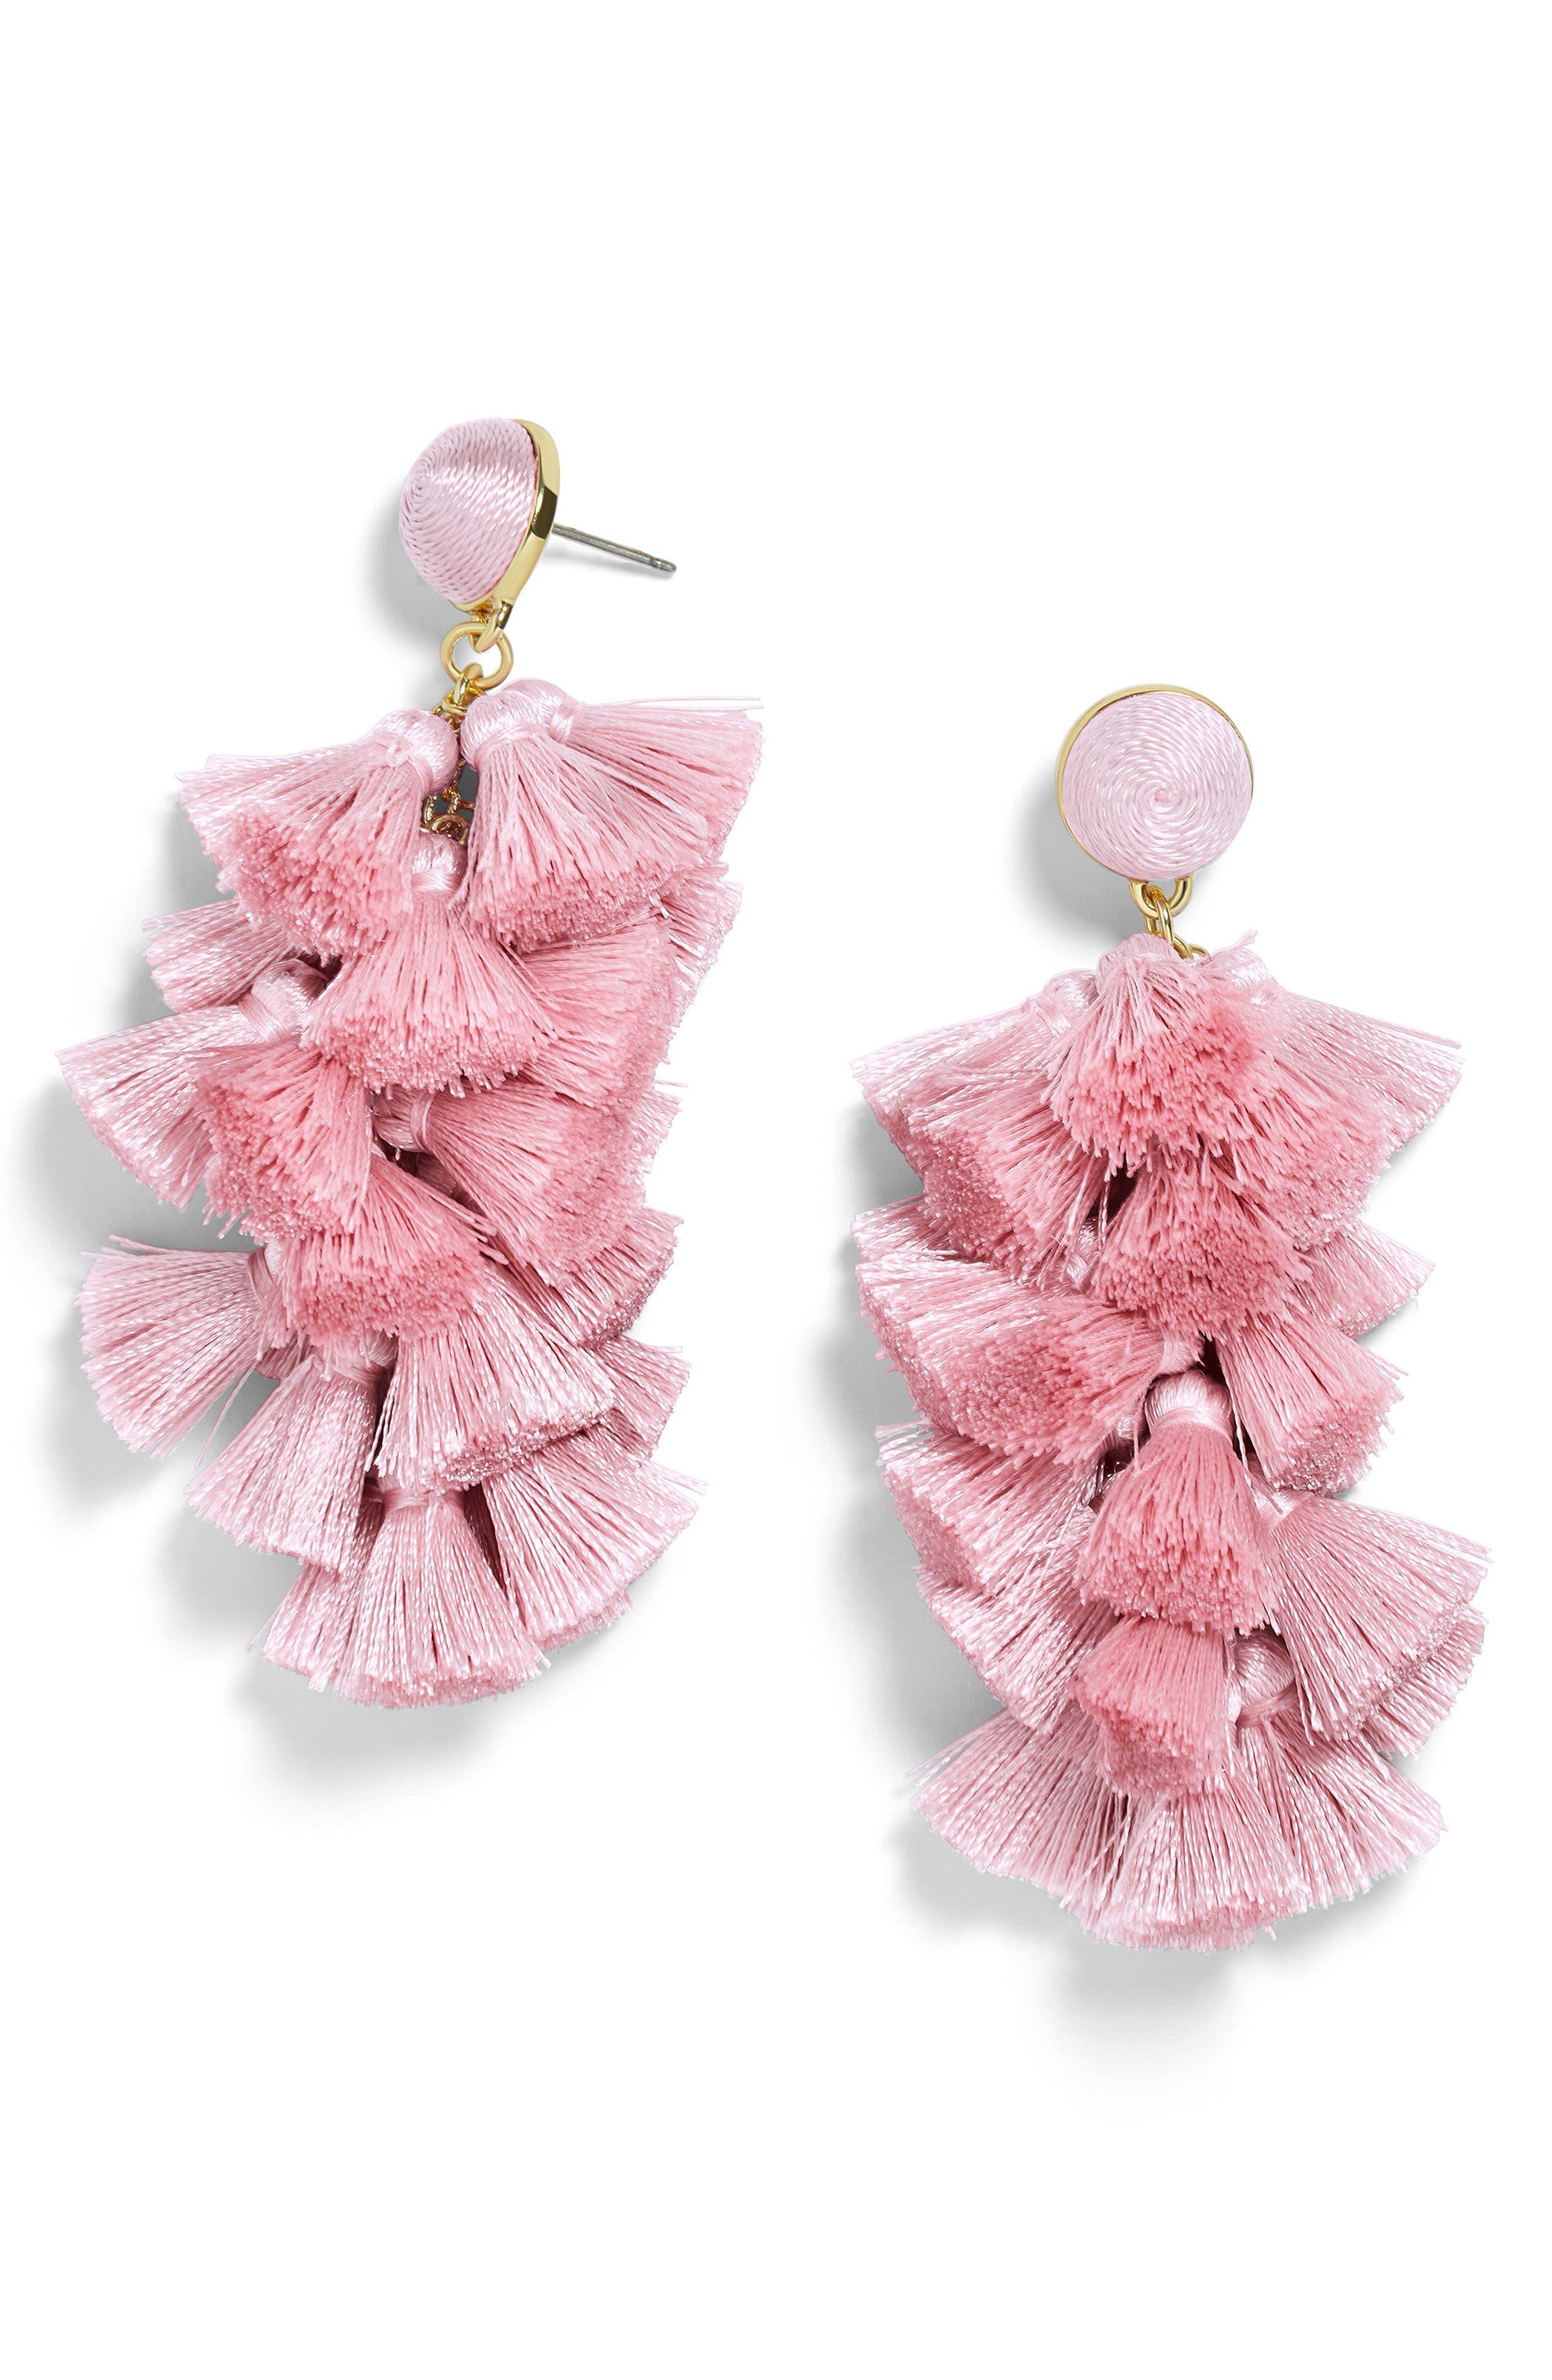 Contessa Tassel Earrings,                             Main thumbnail 1, color,                             Blush